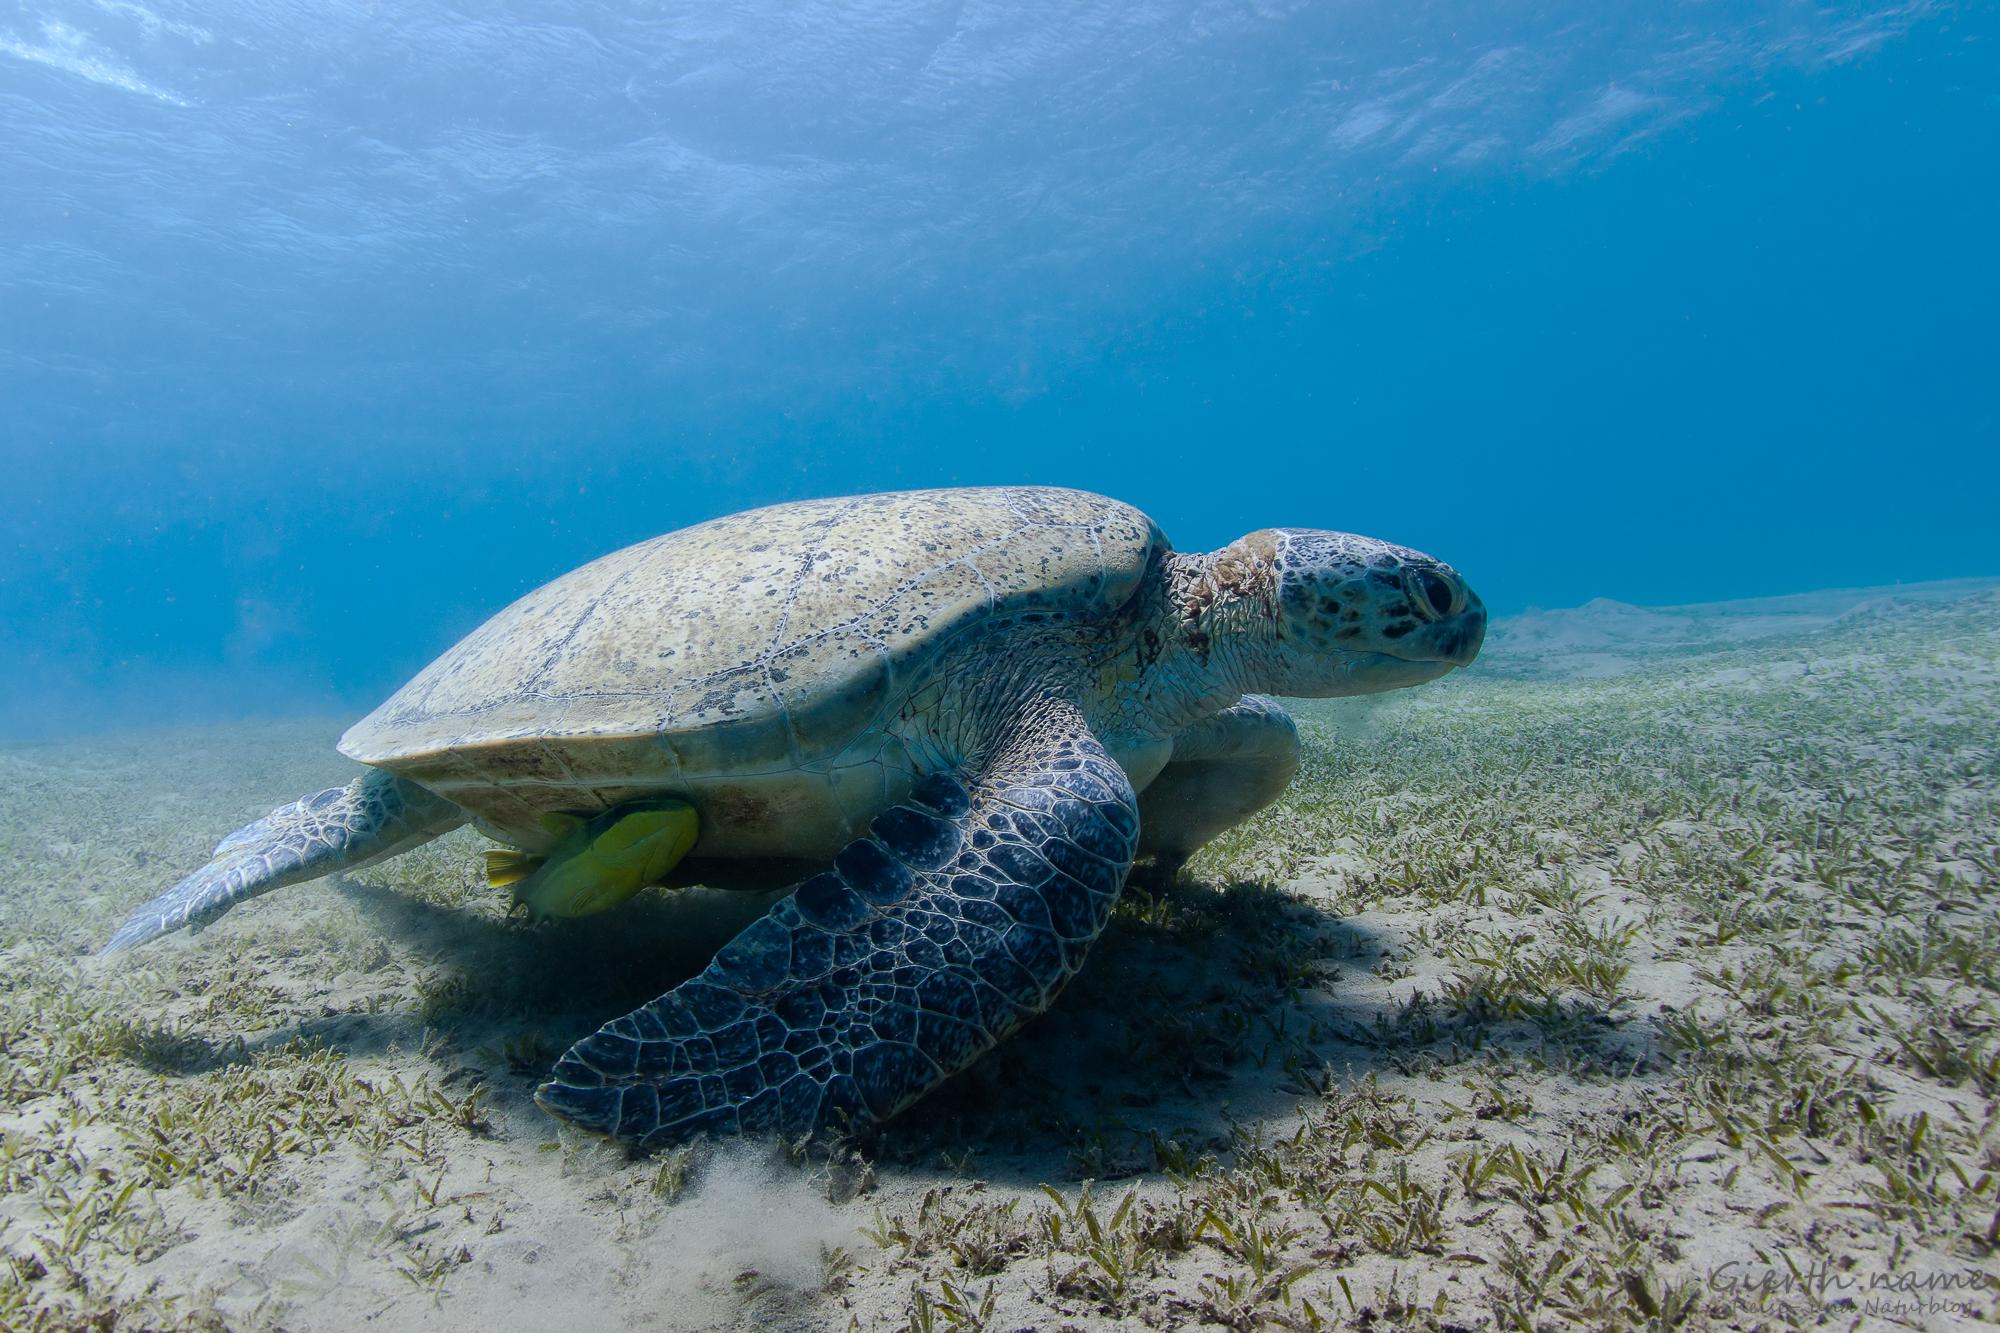 Grüne Schildkröte, Abu Dabab